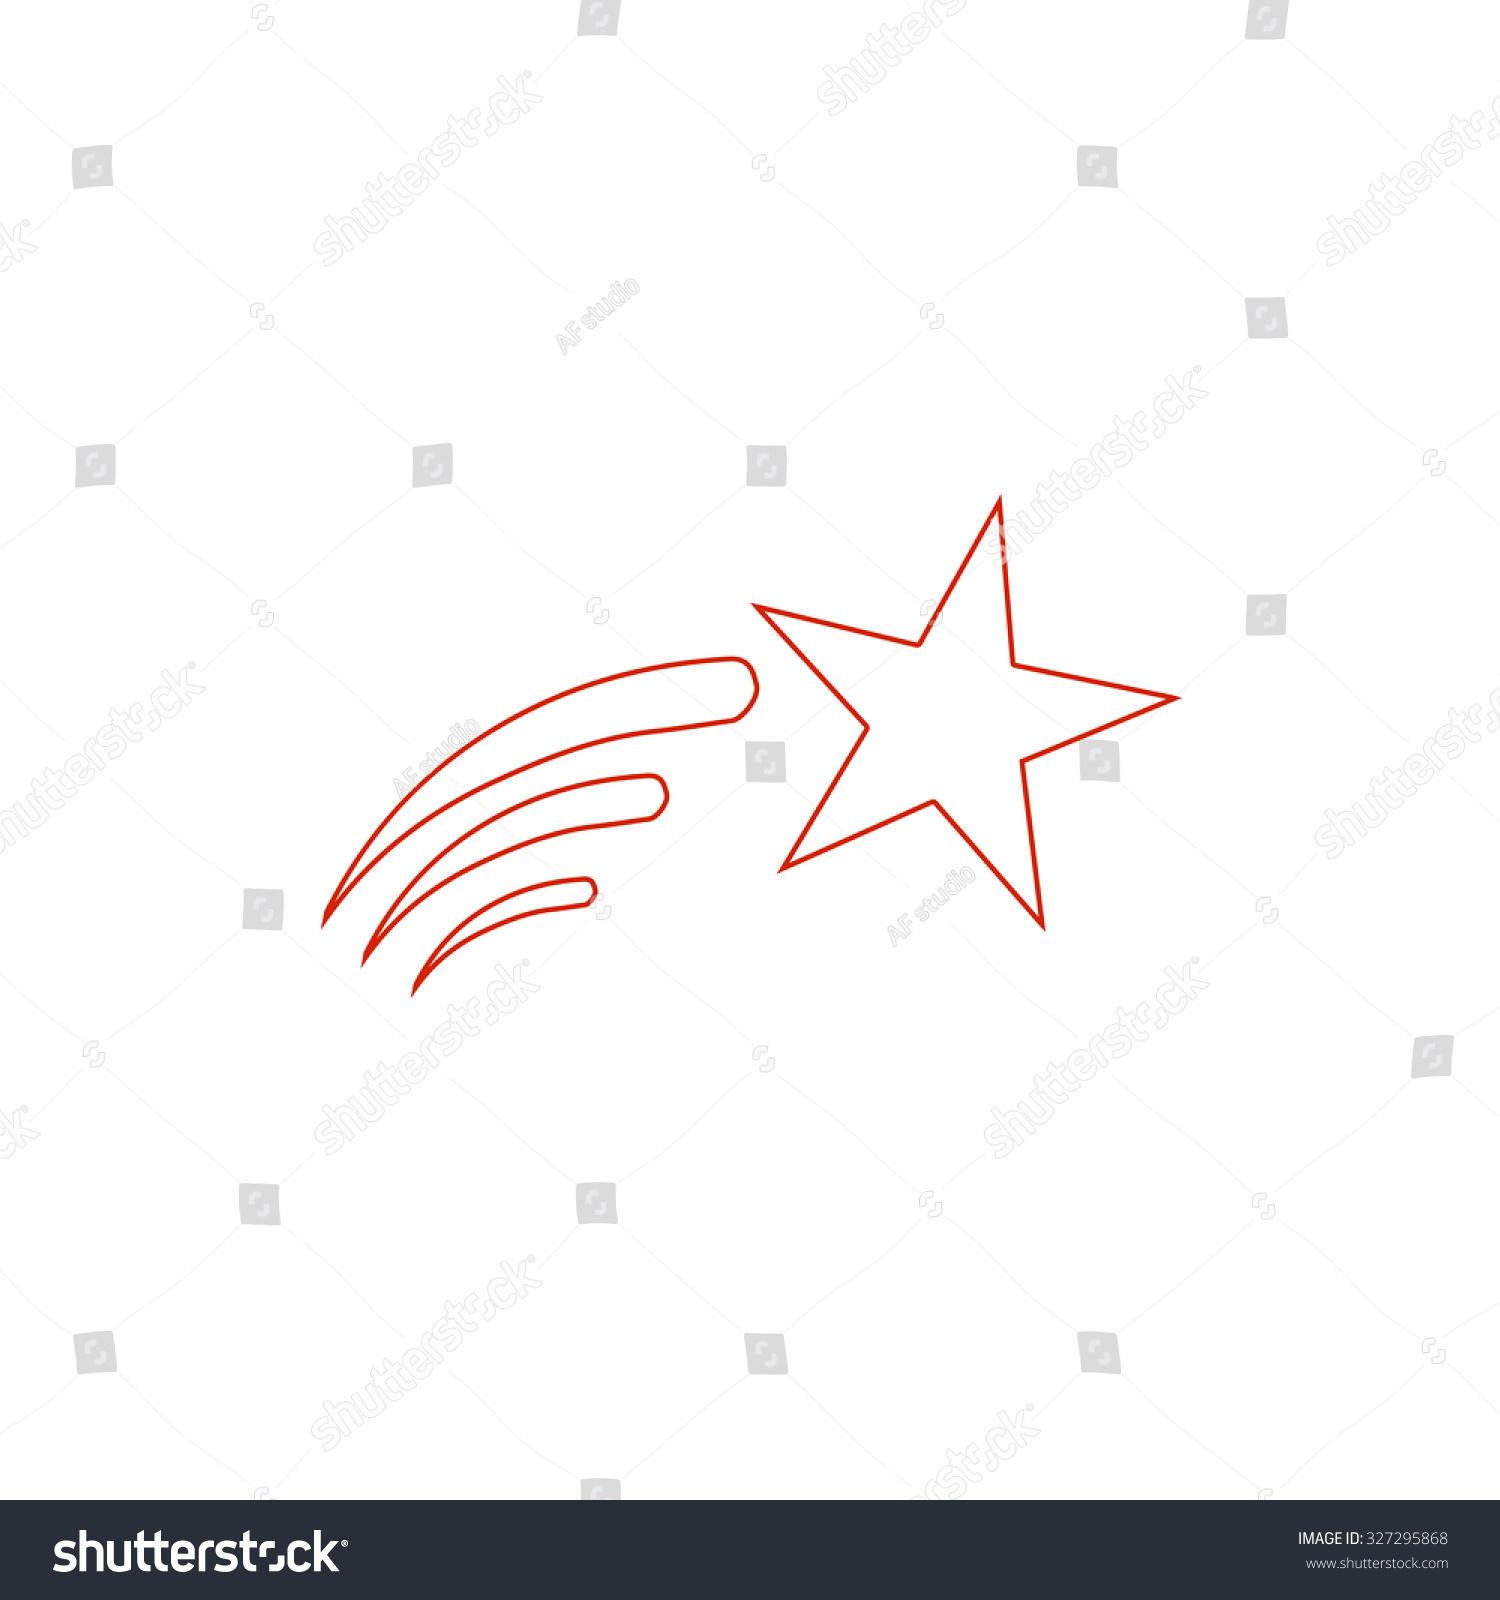 Shooting Star Red Outline Illustration Pictogram Stock Illustration